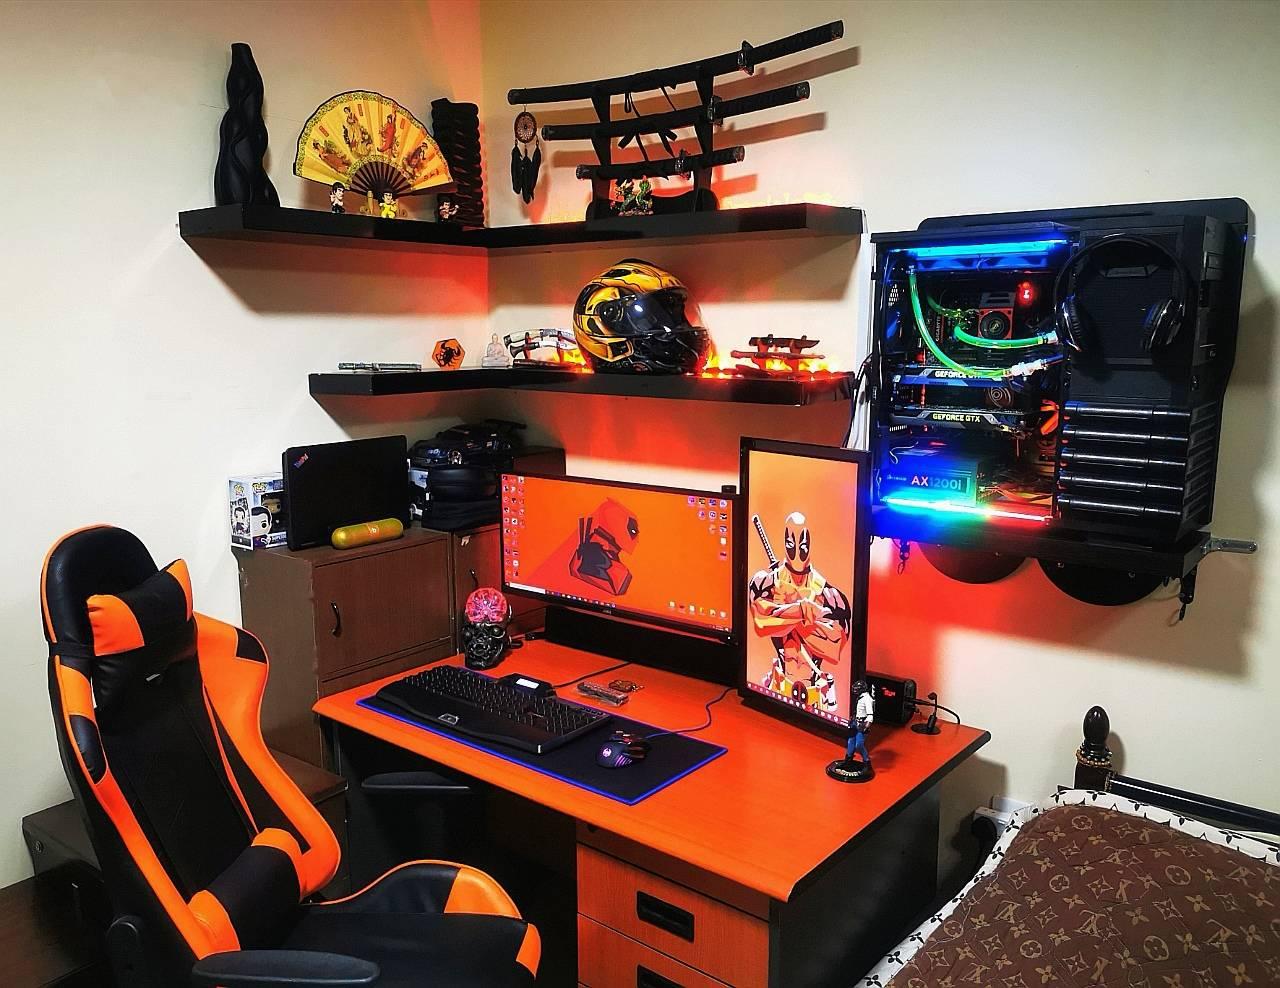 jayracutaspiras's Setup - Vintage minimal Workspace/Gaming Setup | Scooget